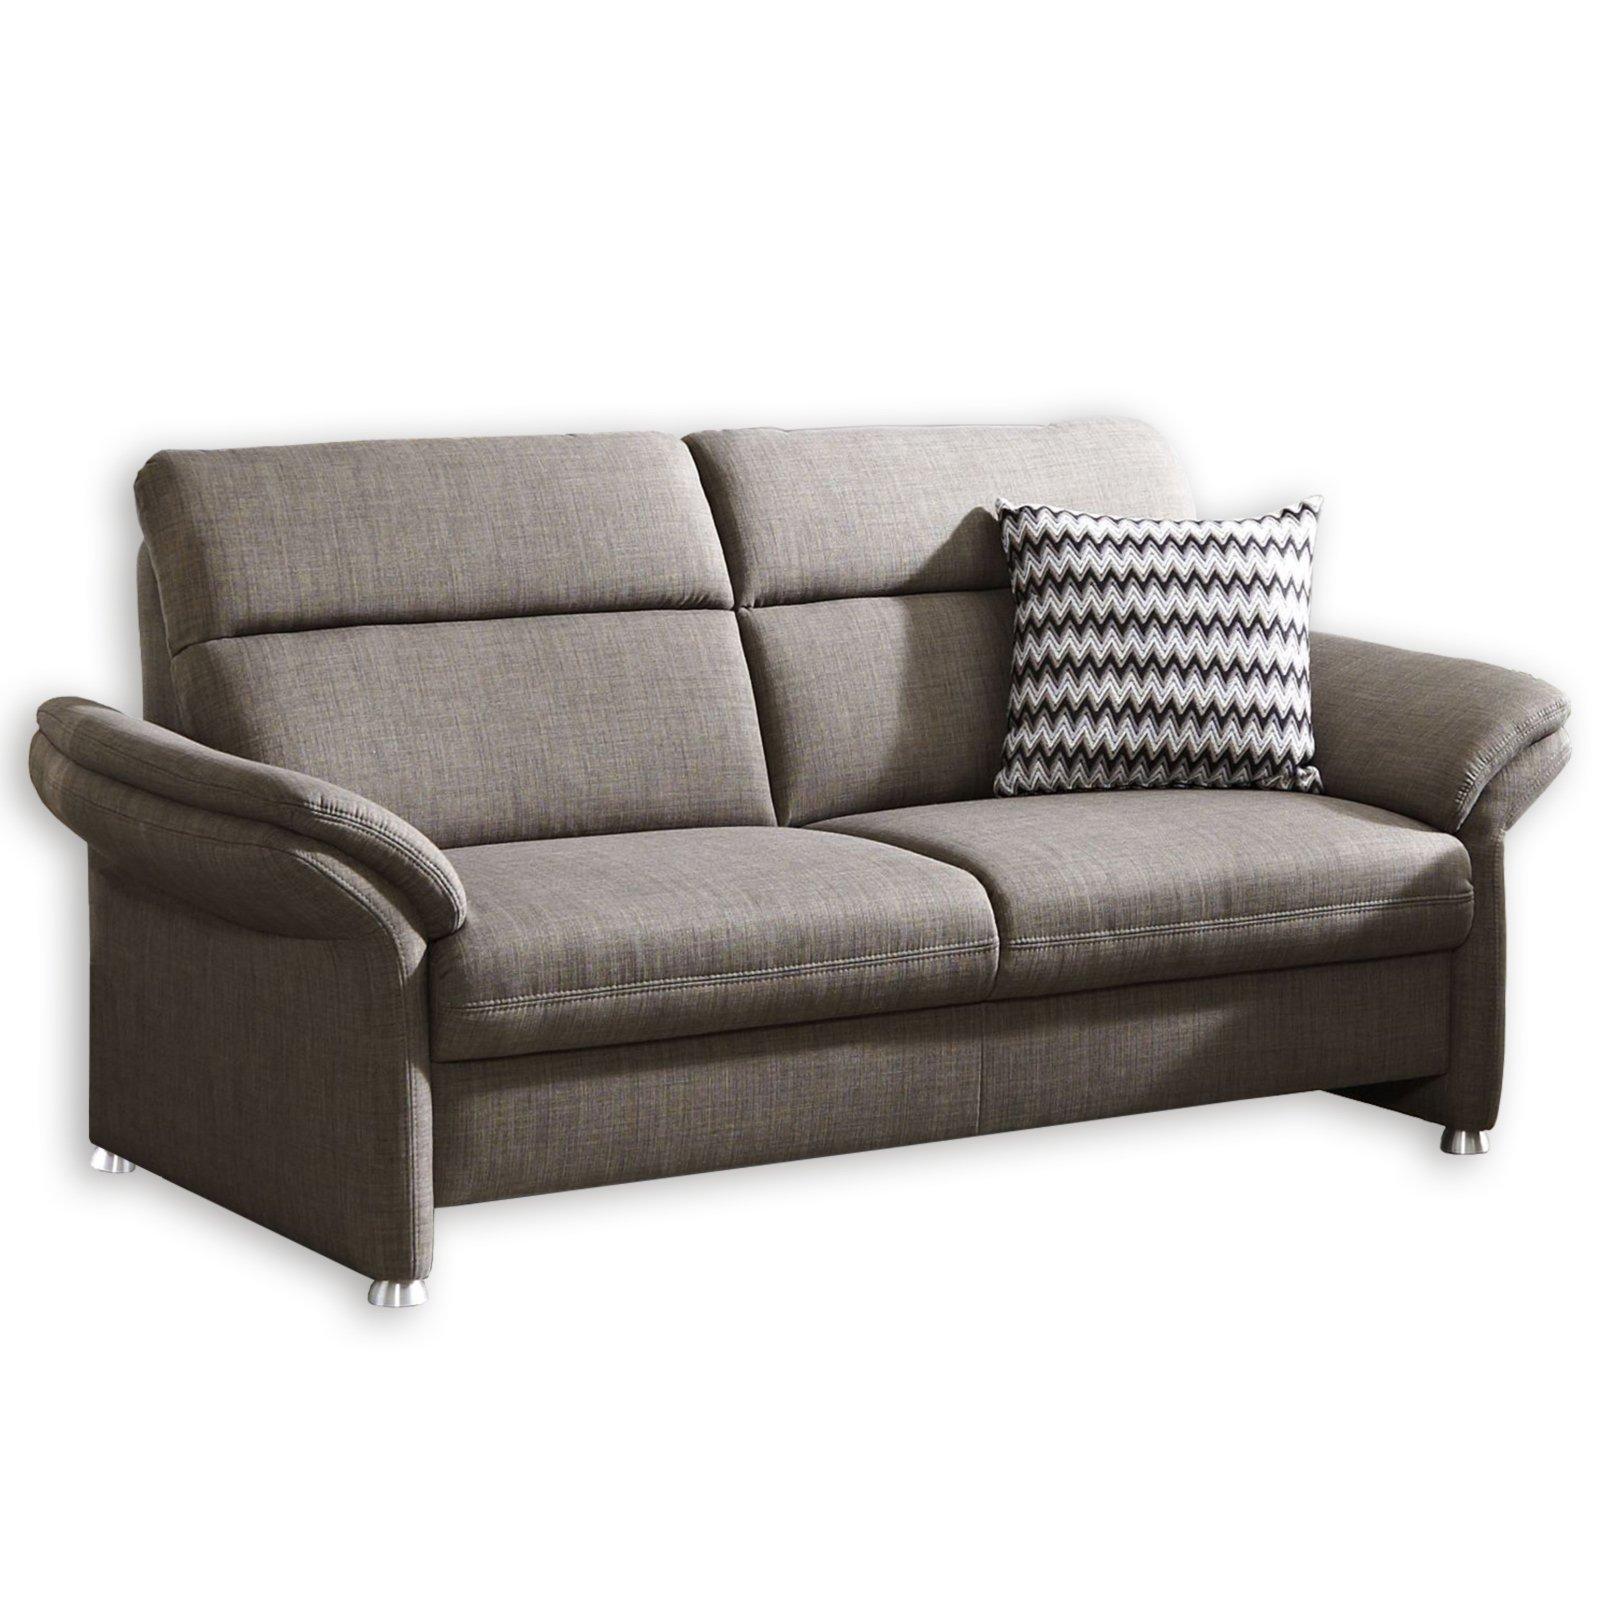 2 sitzer sofa grau softer sitz einzelsofas 2er. Black Bedroom Furniture Sets. Home Design Ideas